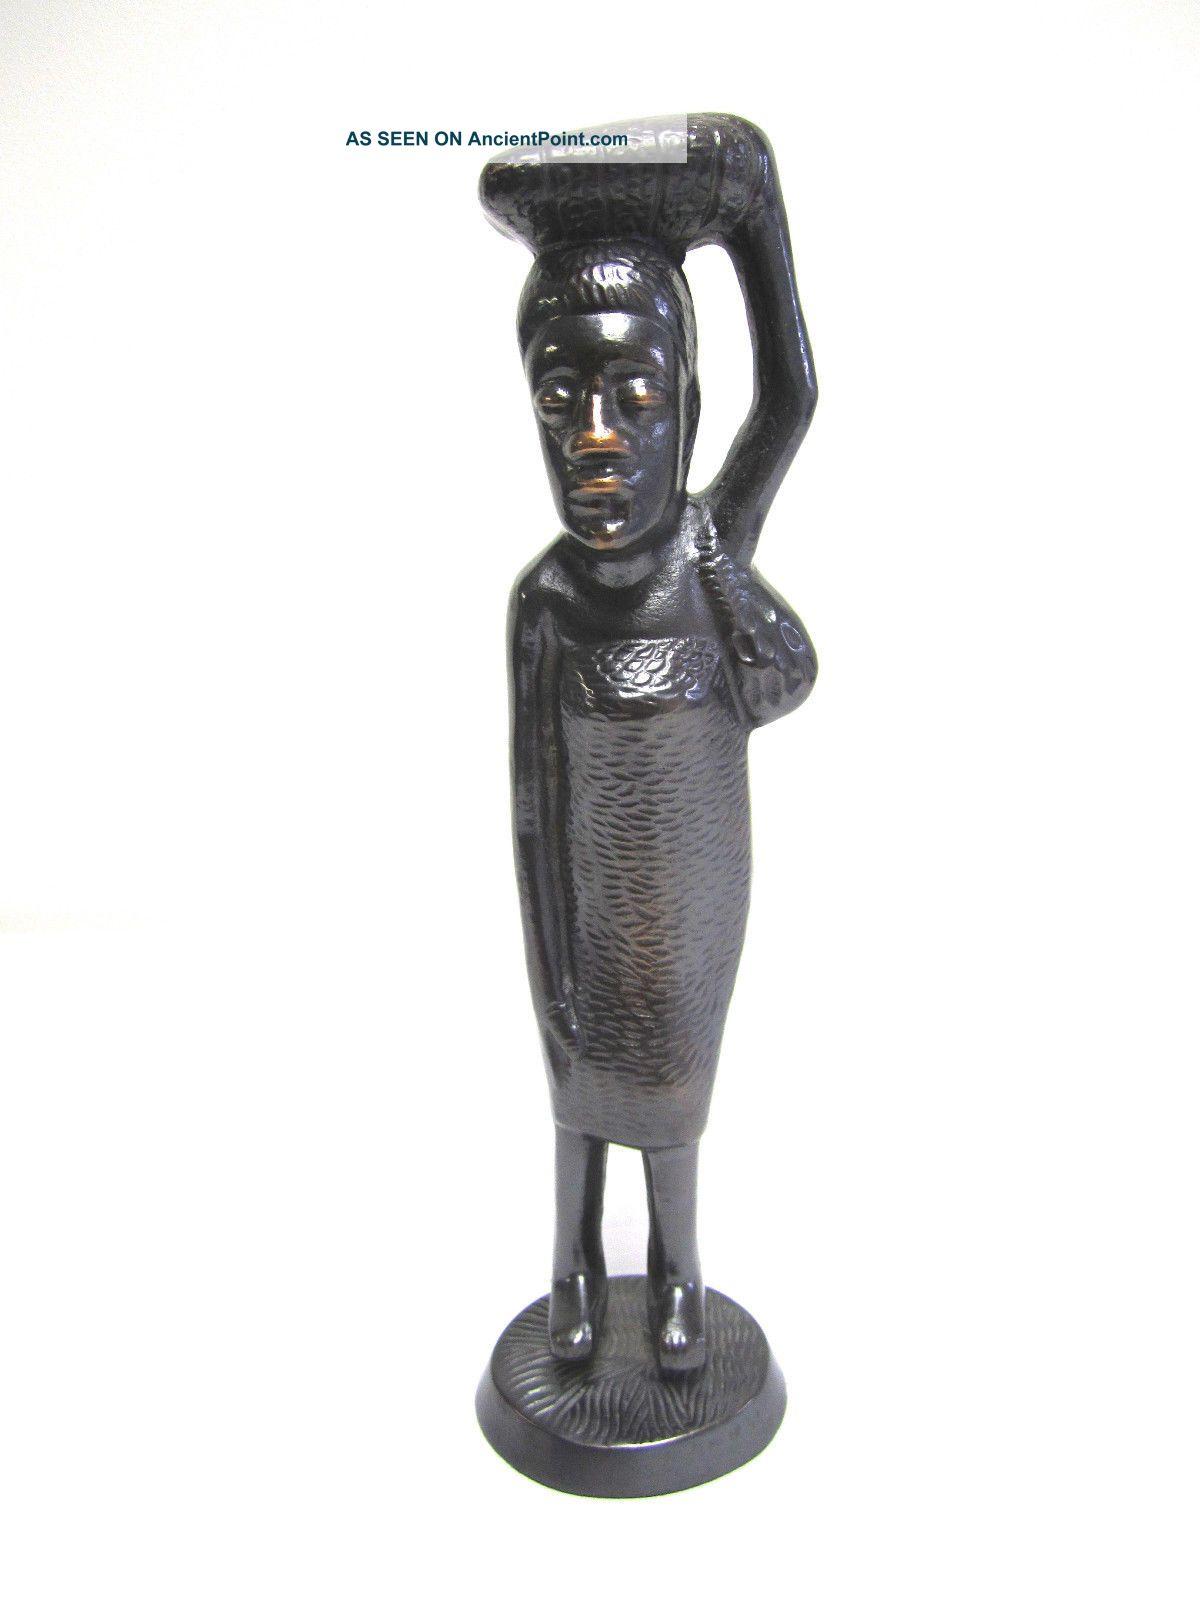 African Primitive Heavy Bronze Like Metal Woman Statue Figurine Sculptures & Statues photo